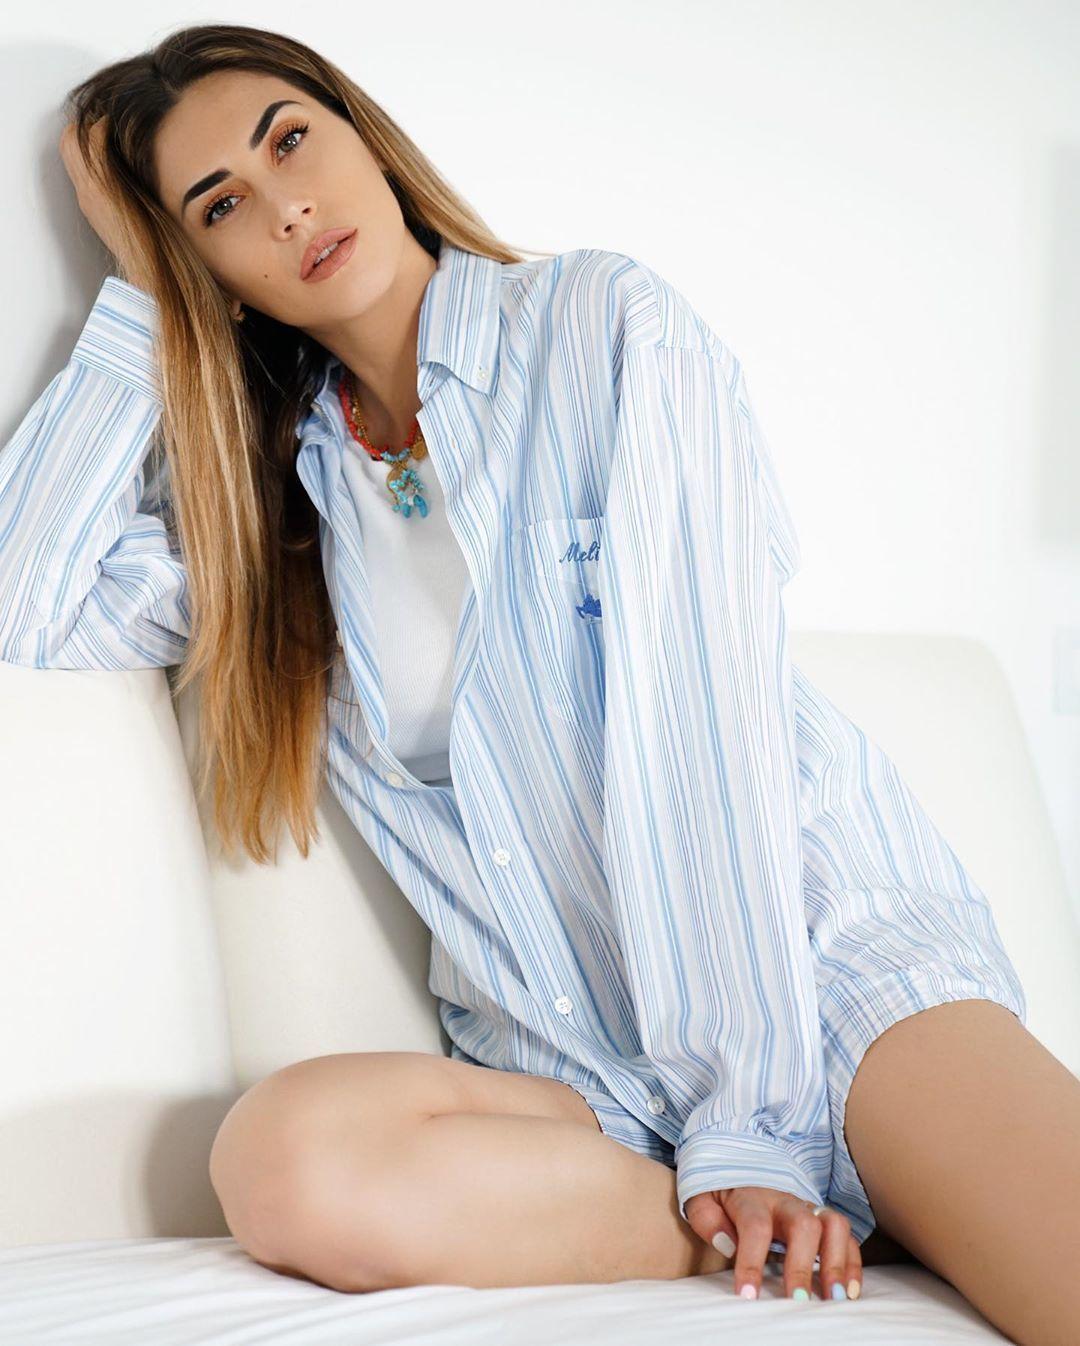 Мелісса Сатта